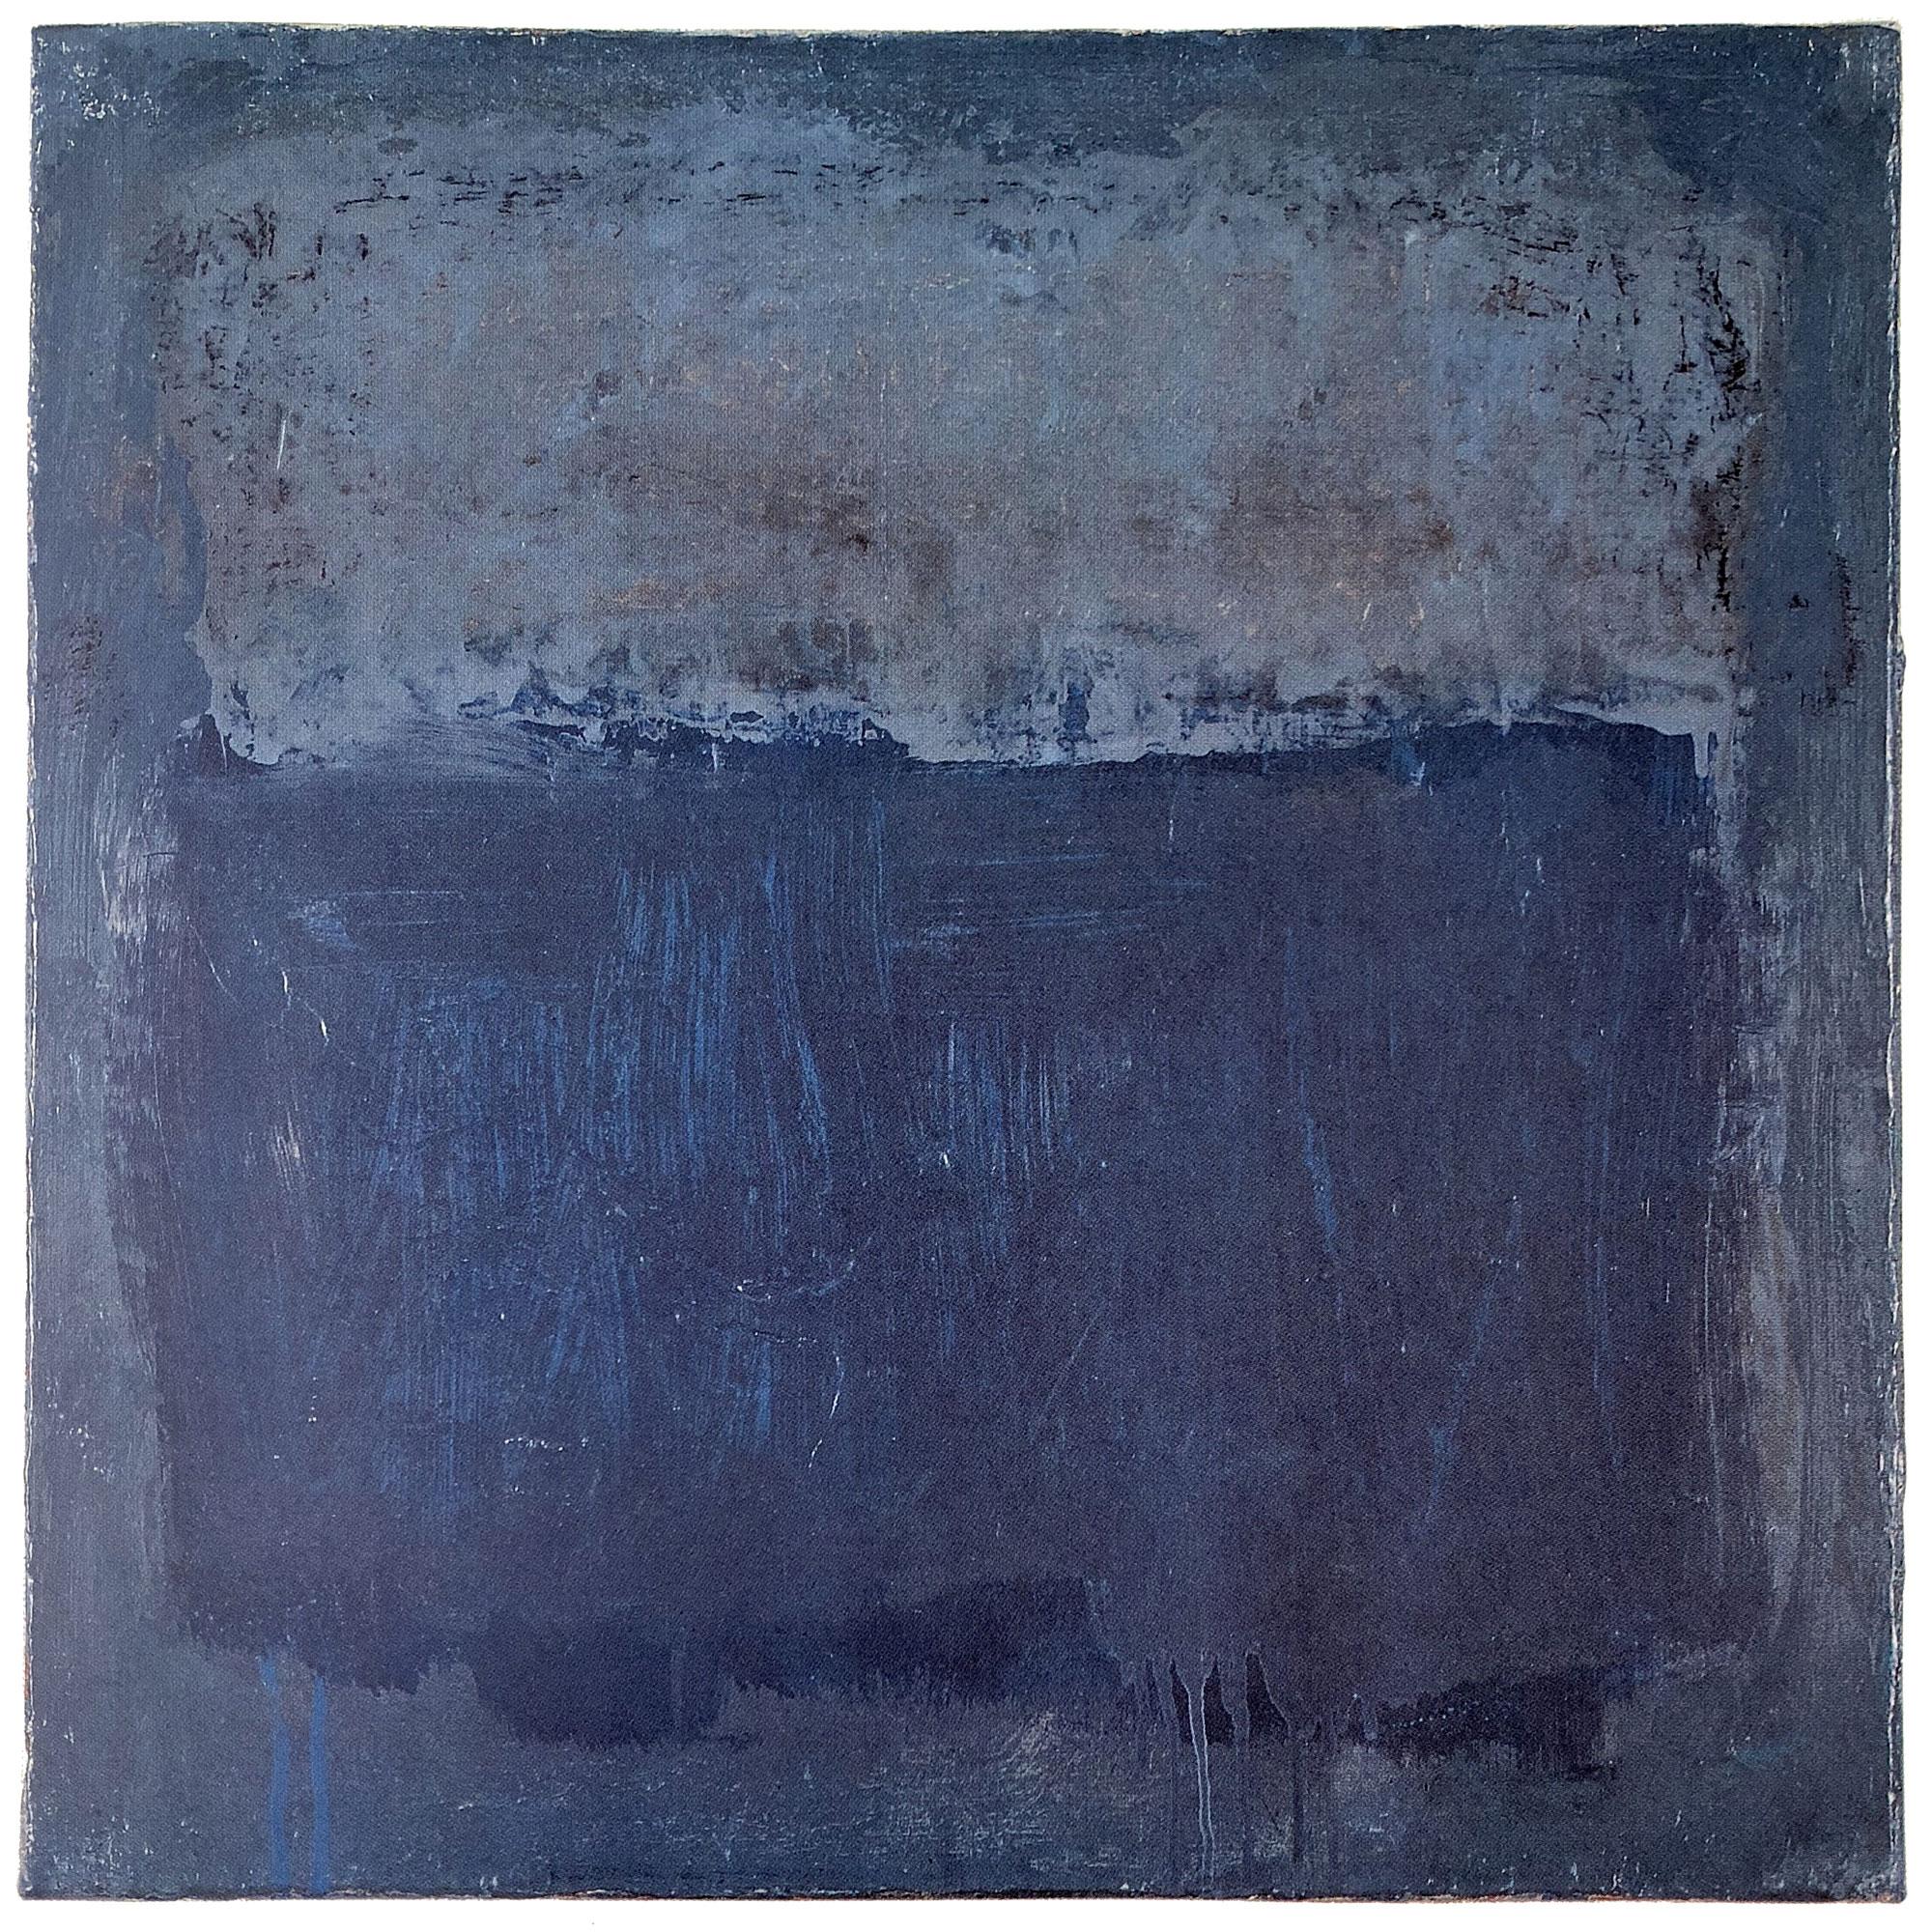 Monochrom-ohne-Titel-2-Öl-auf-Leinwand-80×80-1995